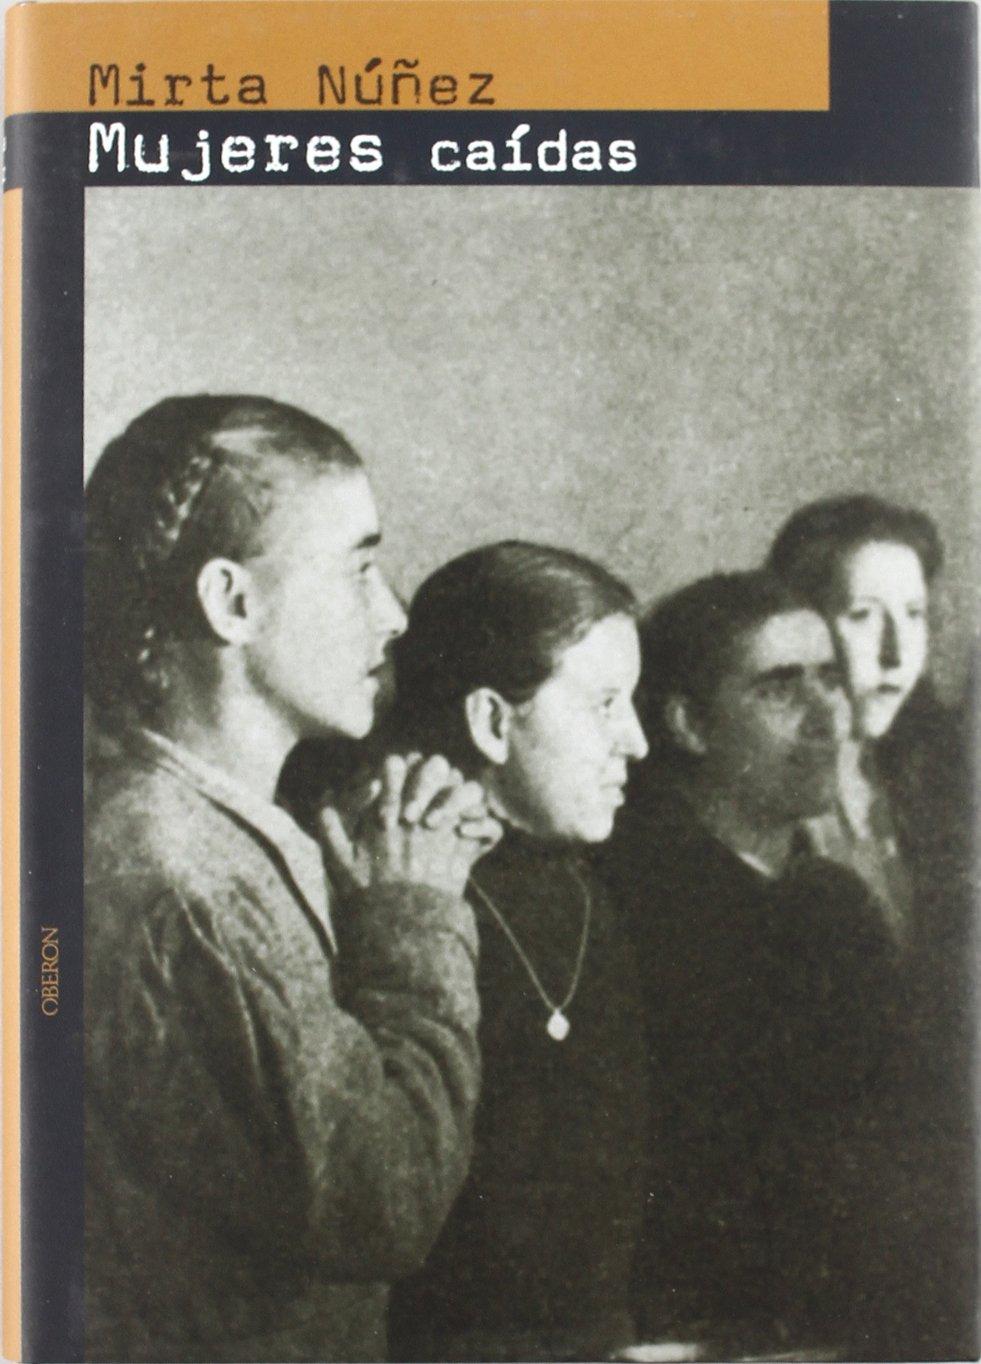 Mujeres caídas: Prostitución en la España franquista Memoria: Amazon.es: Núñez Díaz-Balart, Mirta: Libros